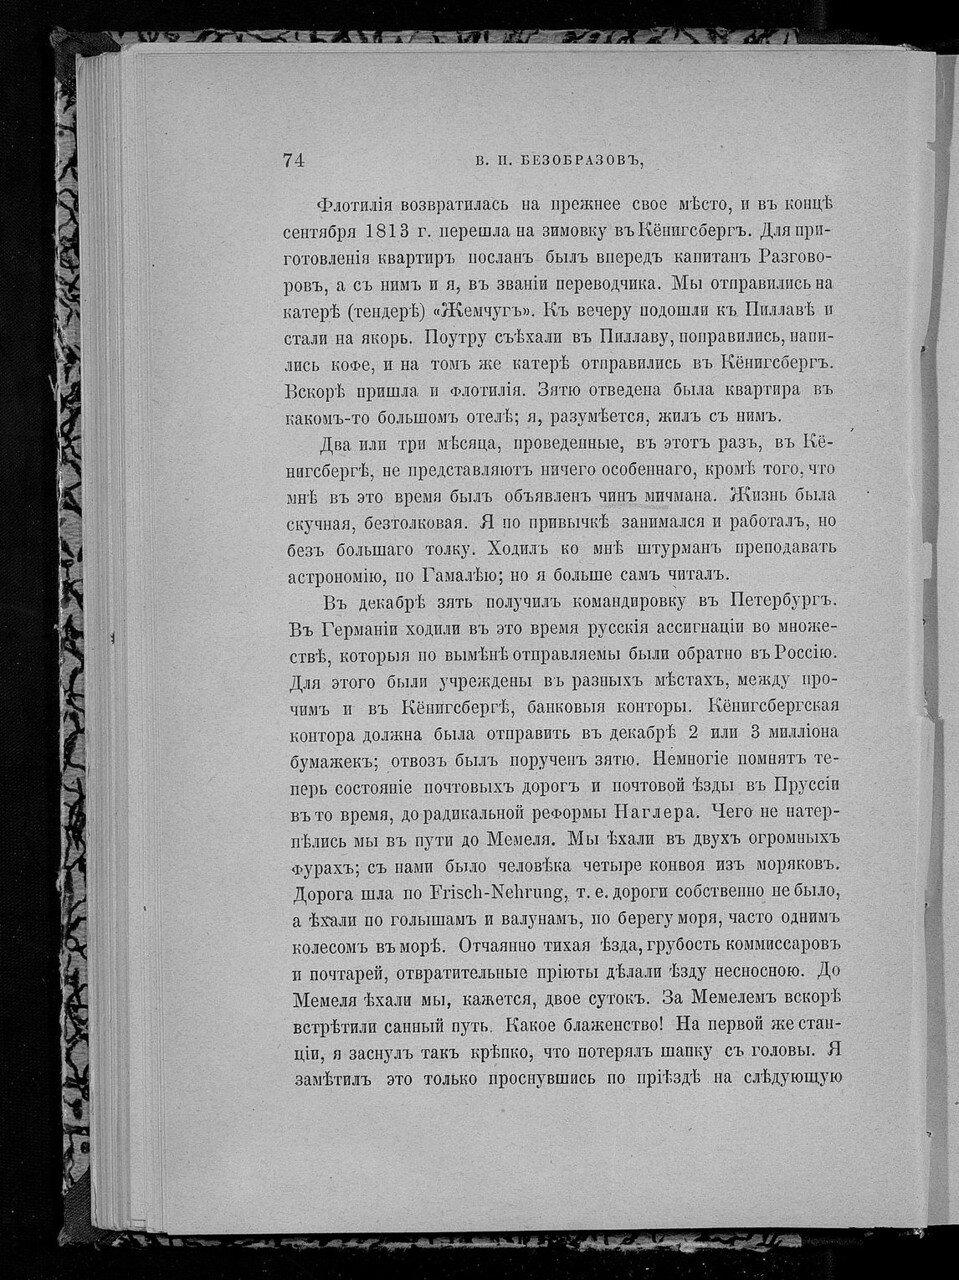 https://img-fotki.yandex.ru/get/893194/199368979.d4/0_21dde9_d2bc6787_XXXL.jpg